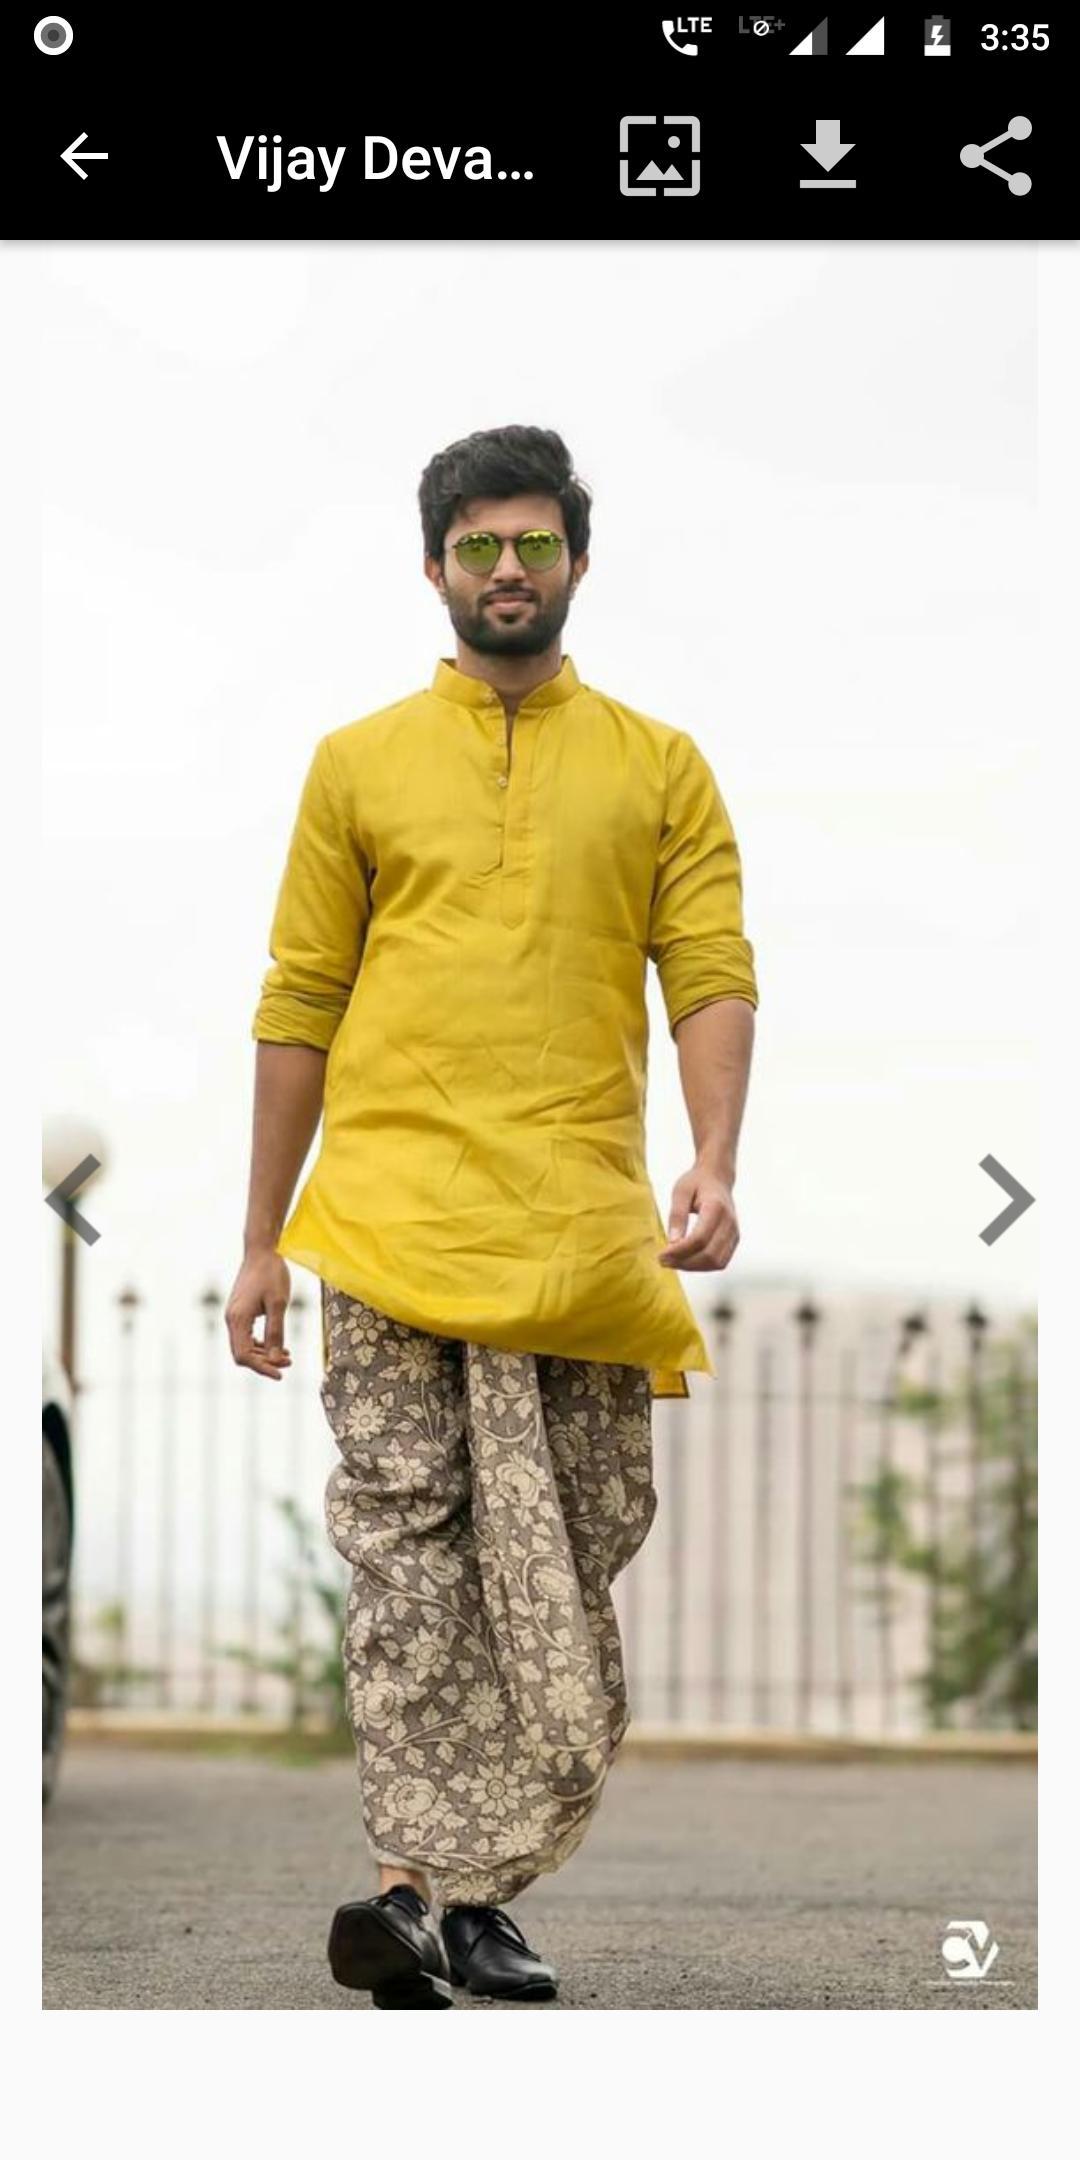 Vijay Devarakonda Wallpapers And His Movies Lyrics For Android Apk Download